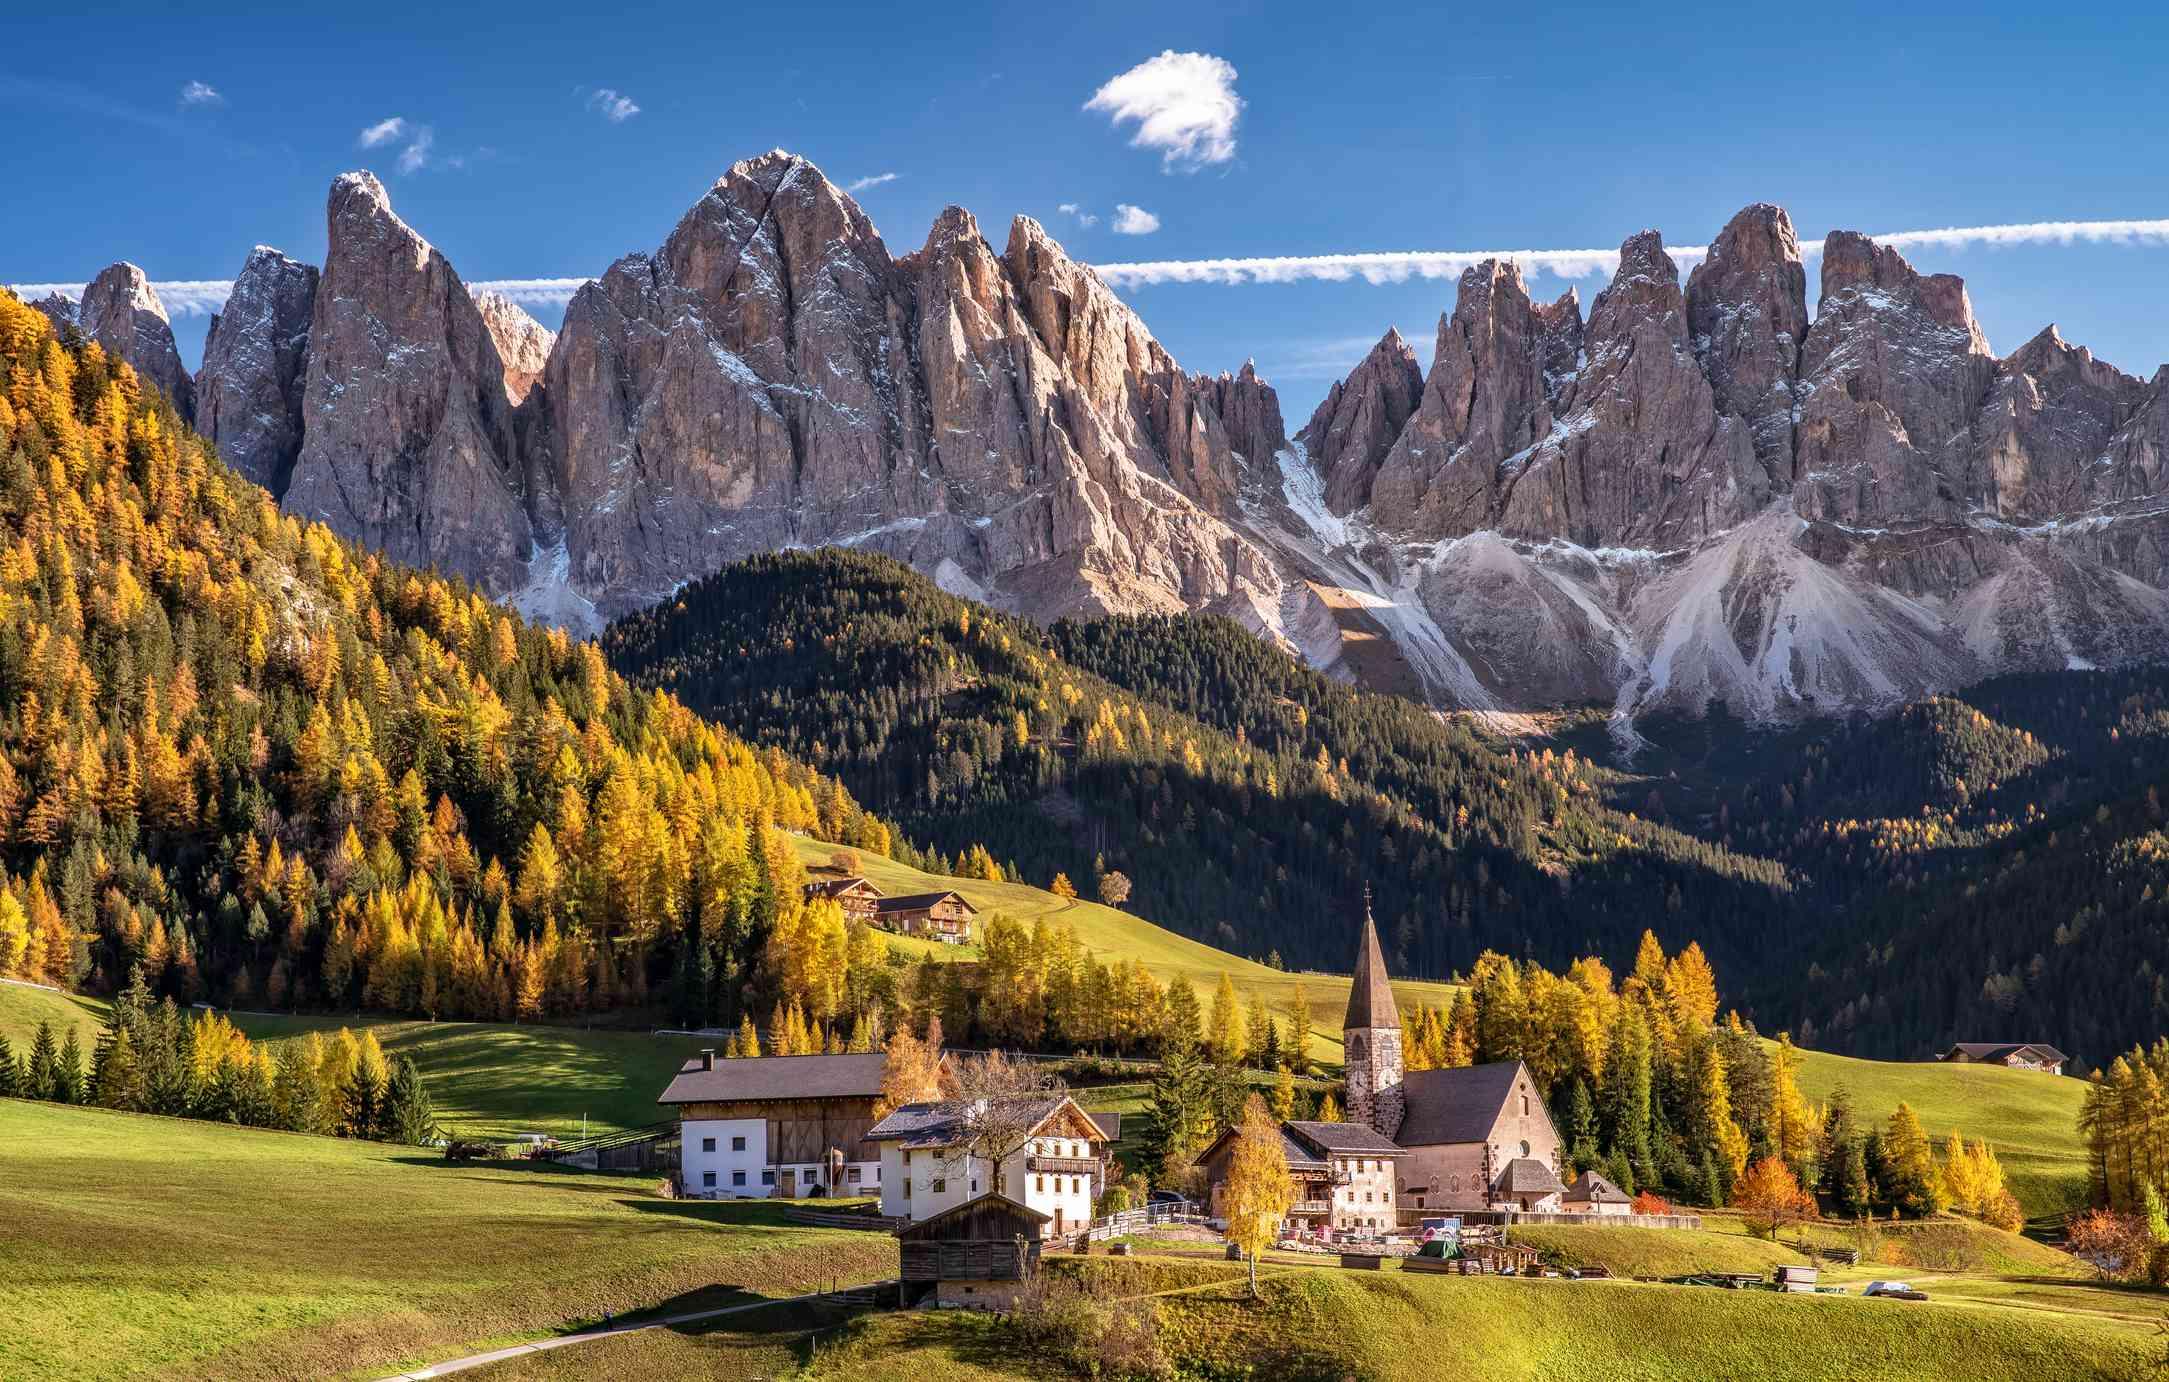 Villnoess St. Magdalena at Val di Funes (Funes Valley), Alto Adige, Italy.